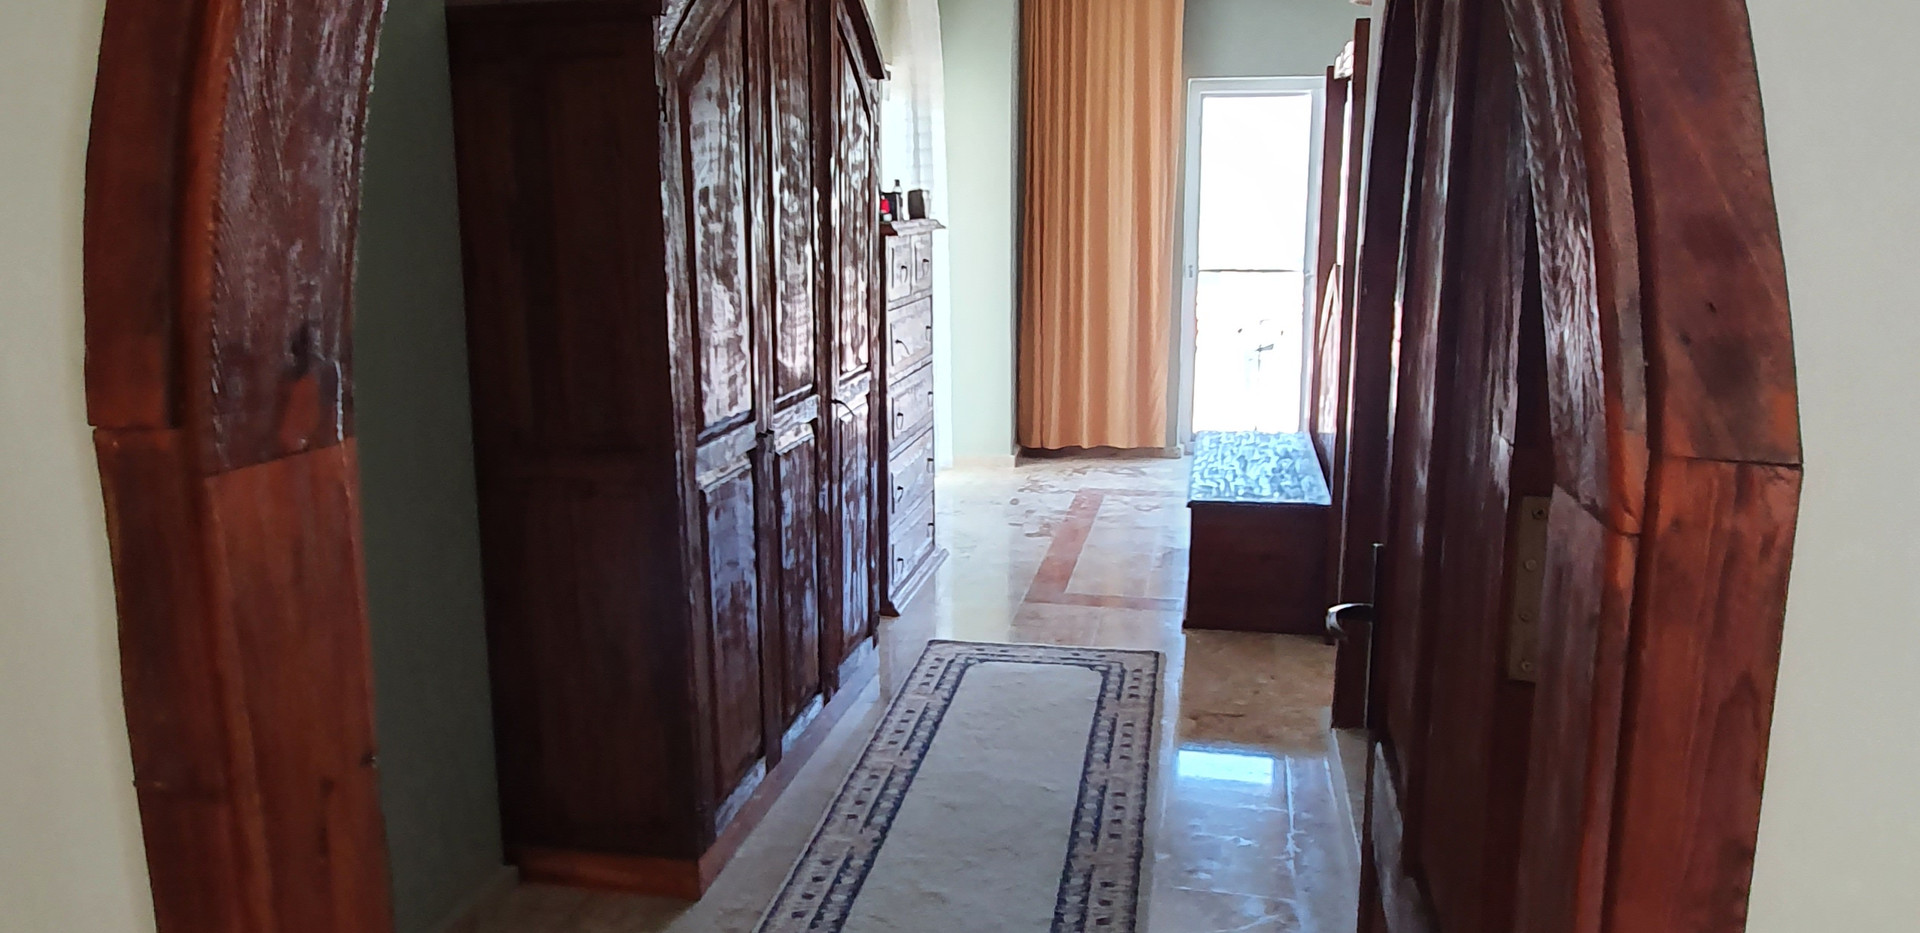 Decorative doorways